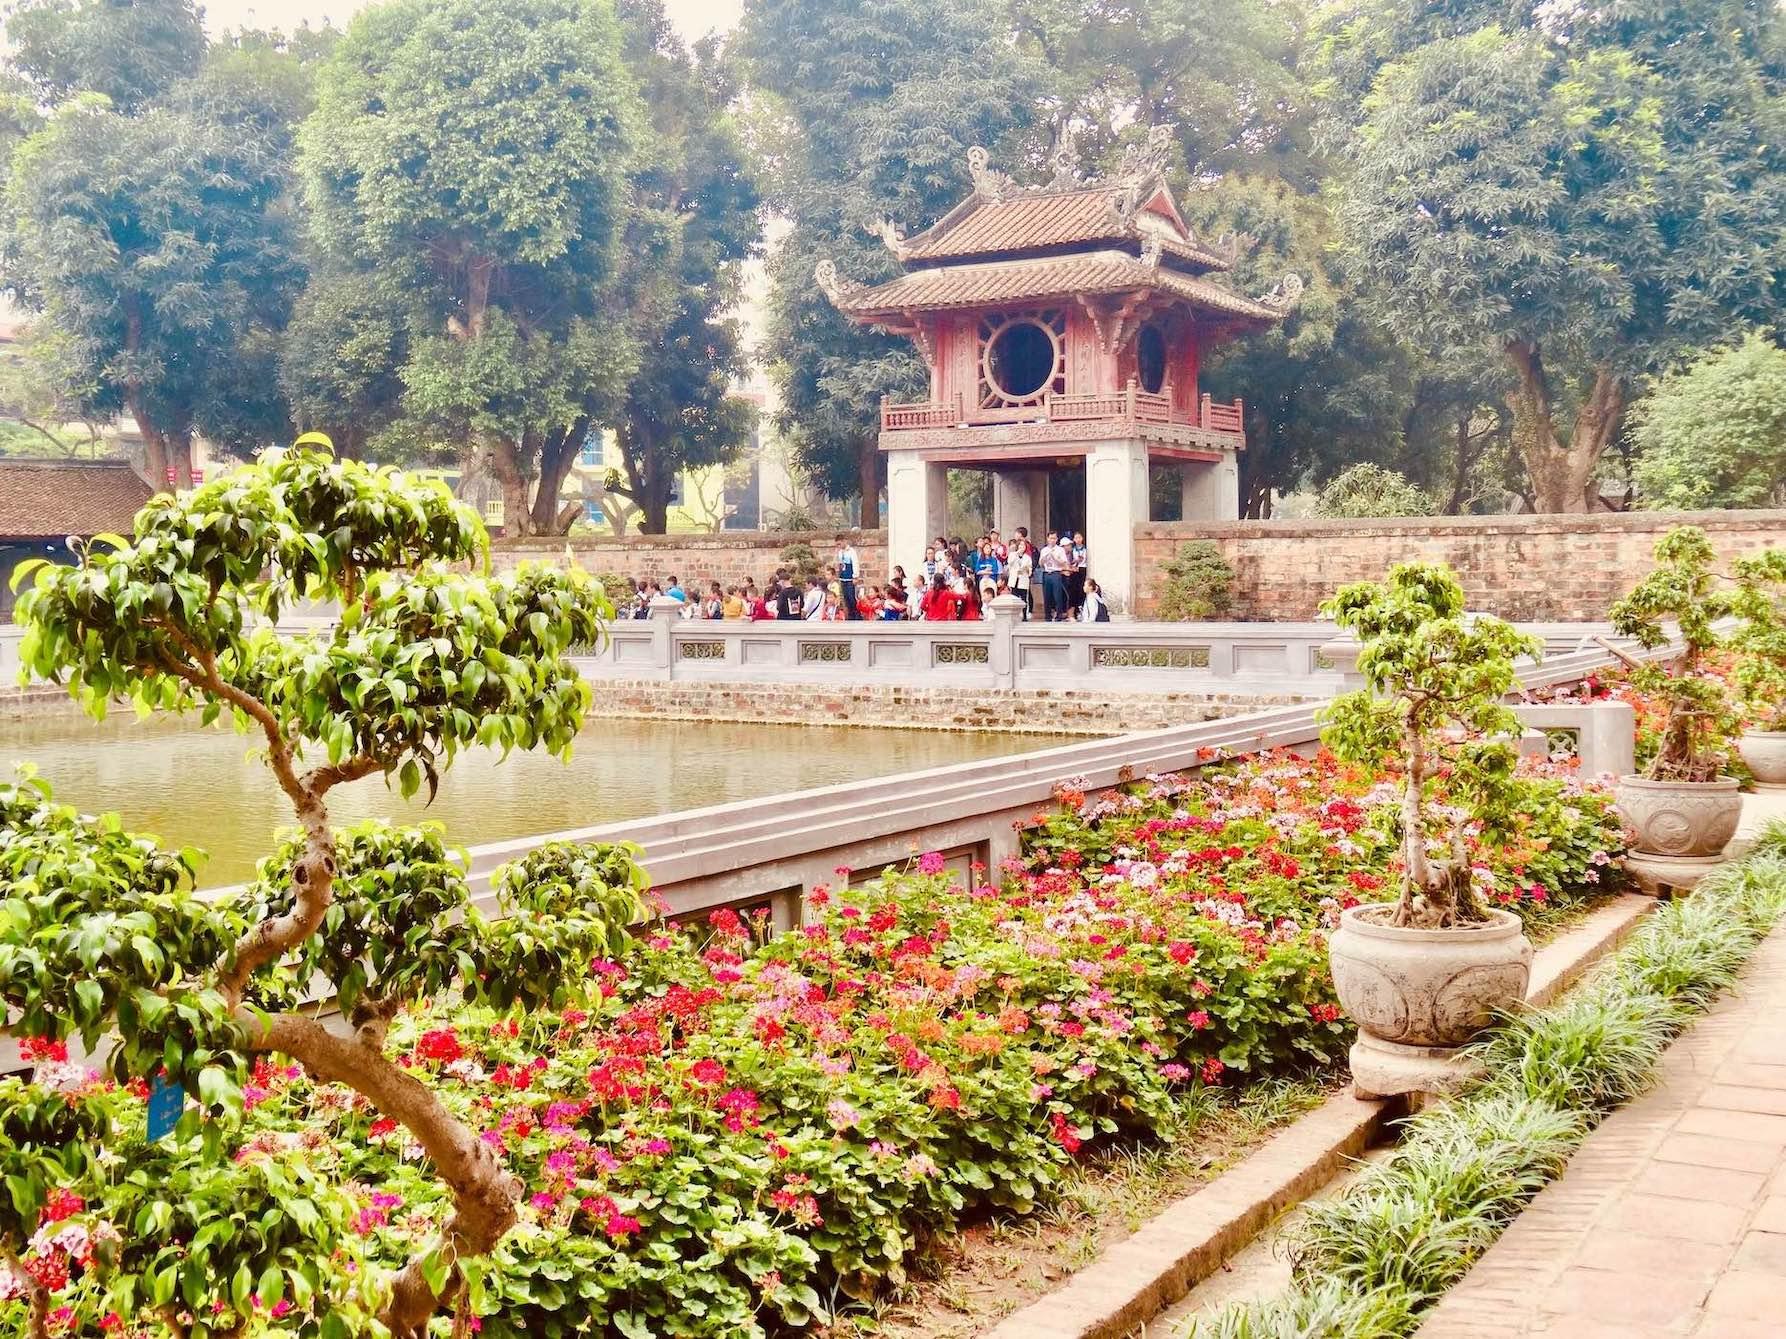 Third Courtyard Temple of Literature